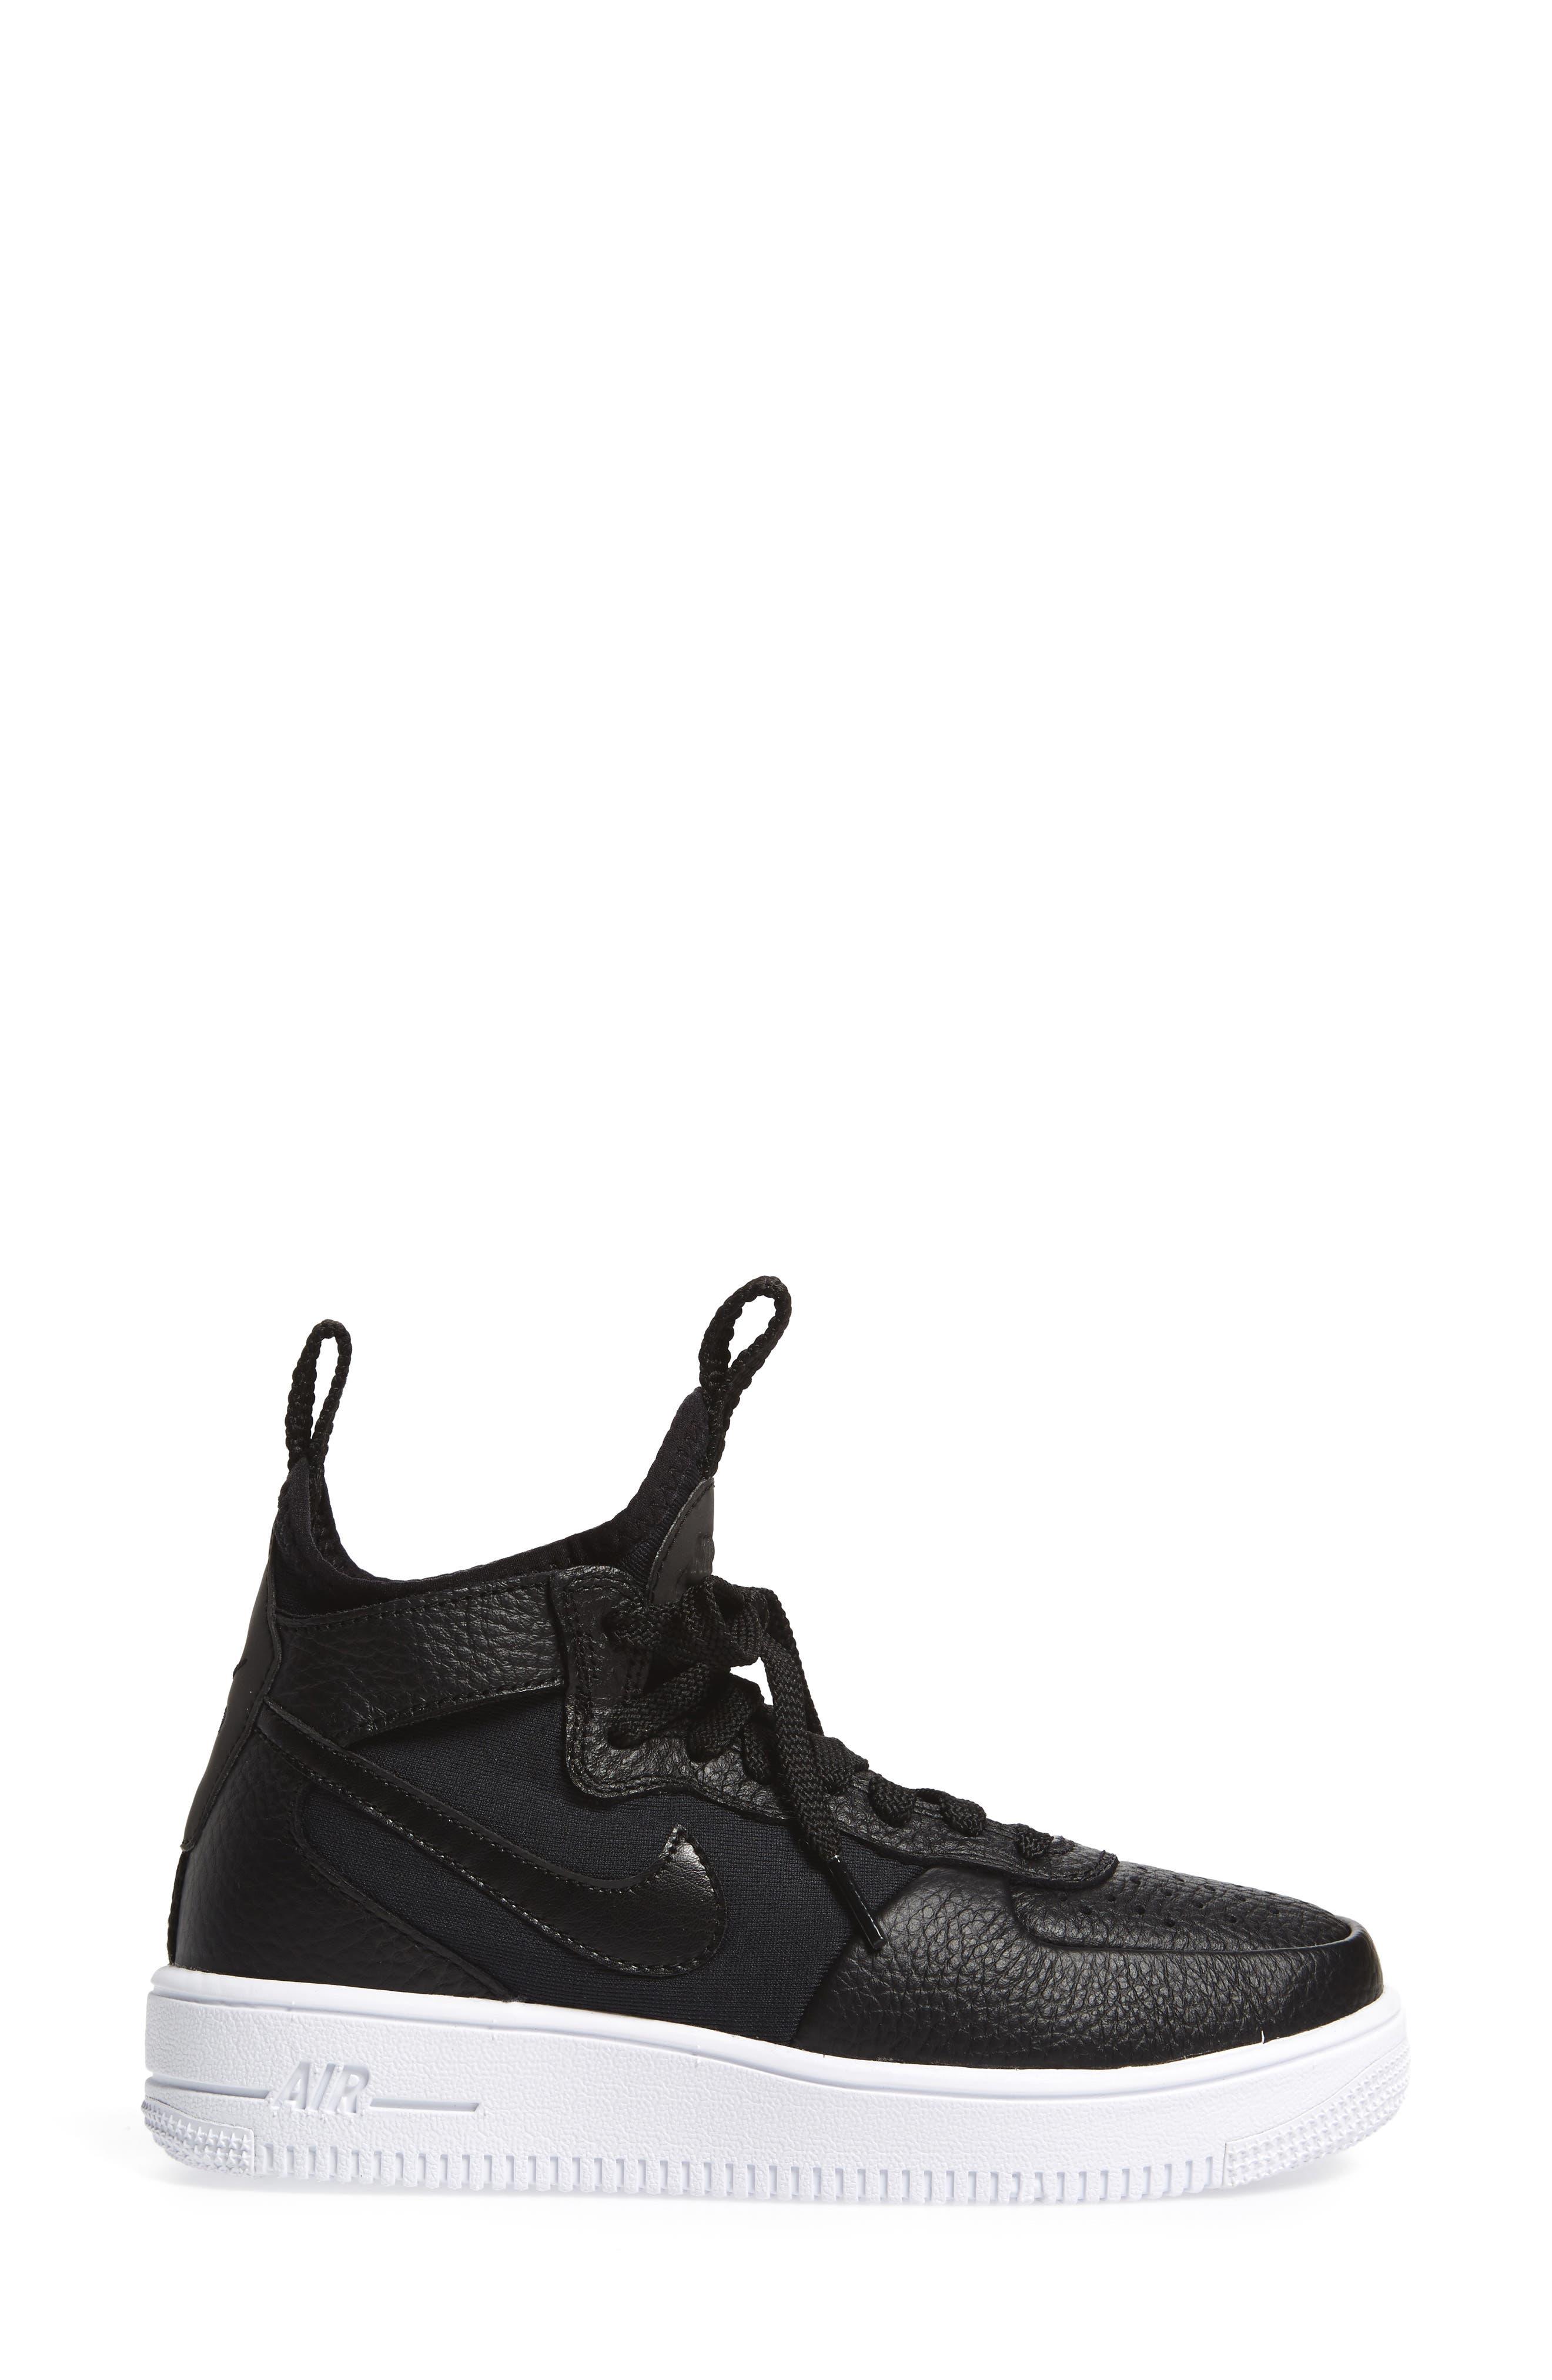 Air Force 1 Ultraforce Mid Sneaker,                             Alternate thumbnail 3, color,                             005